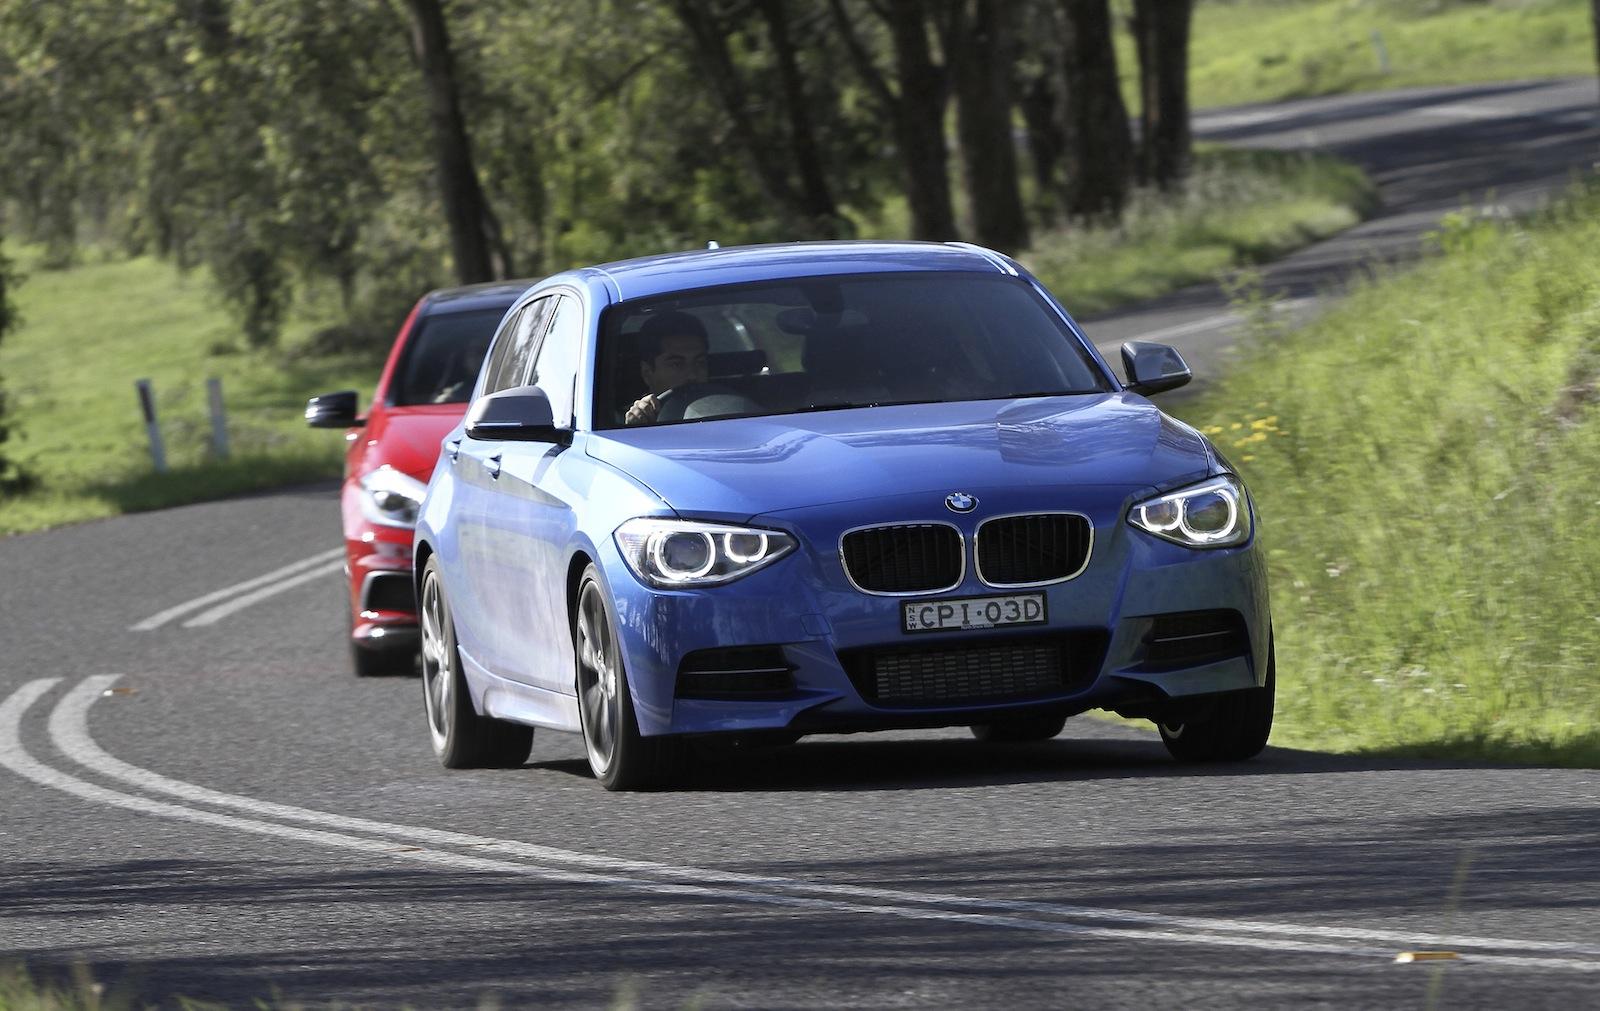 2019 BMW 3 Series vs. sport sedan rivals: Comparing the specs